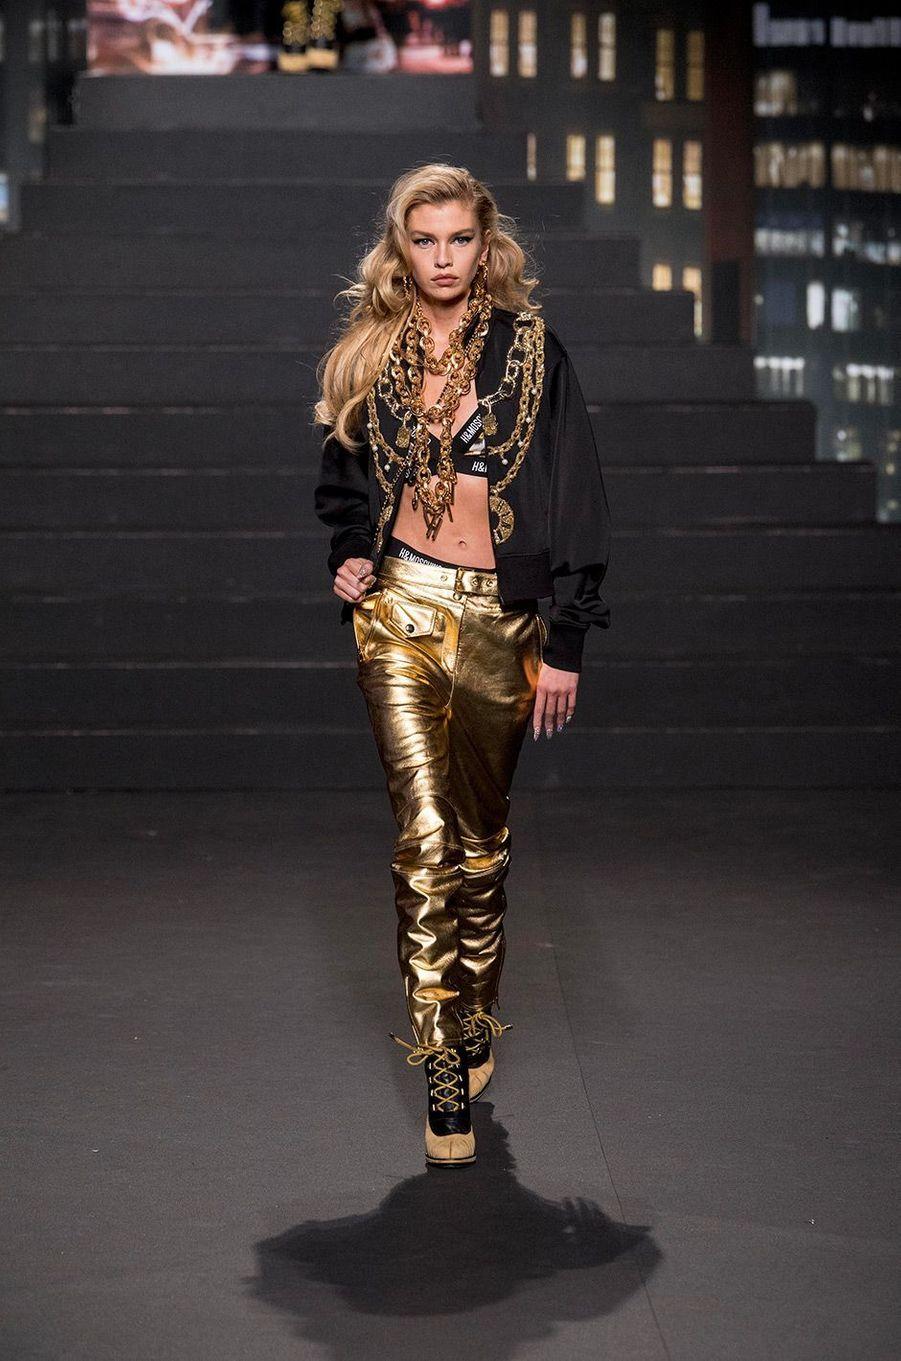 Stella Maxwell au défilé Moschino [tv] H&M, à New York, mercredi 24 octobre